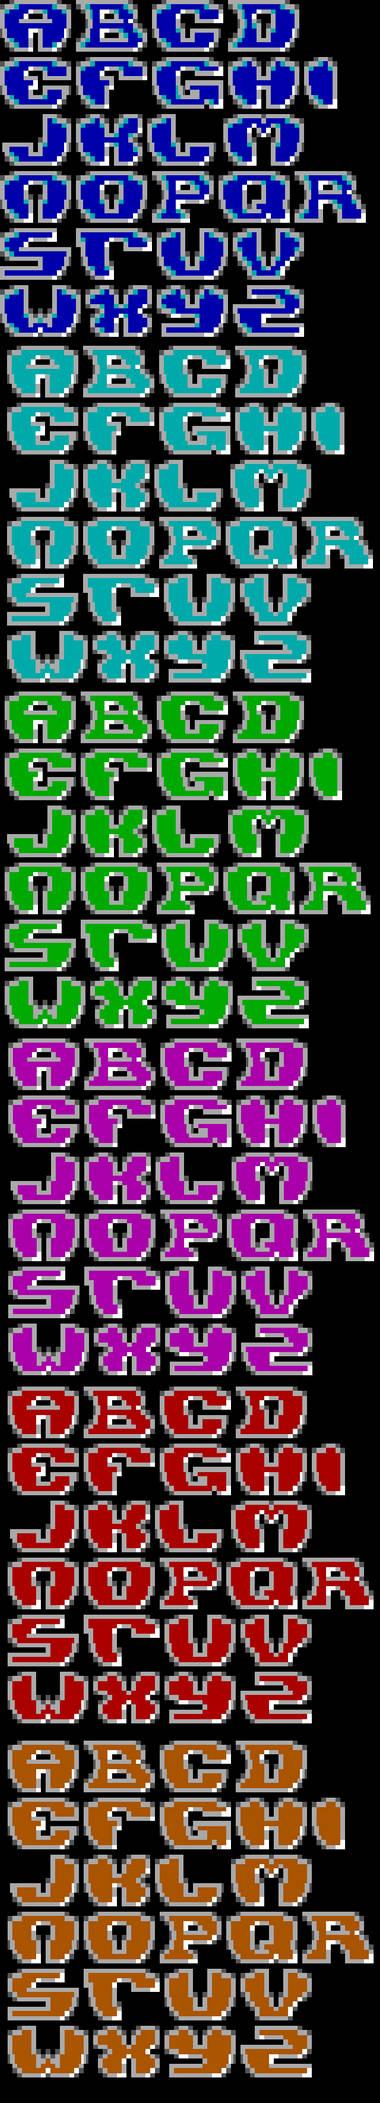 TheDraw TDF ANSI Font - Font 76